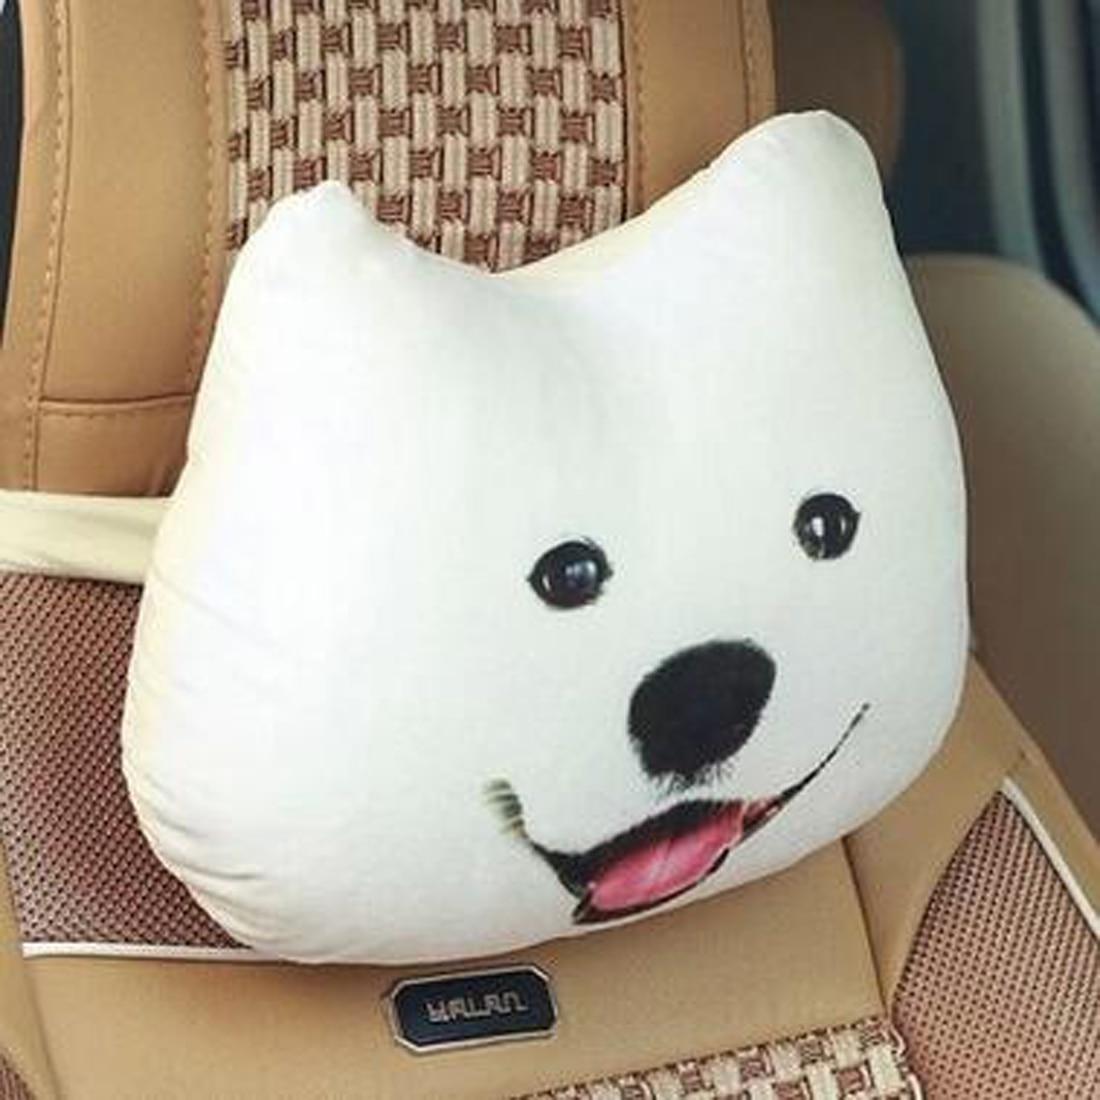 30X25cm Car Styling Headrest Neck Pillow Carbon Breathe Pillow 3D Dog Cat Seat Car Cover Head Neck Cushion Pad Car-styling